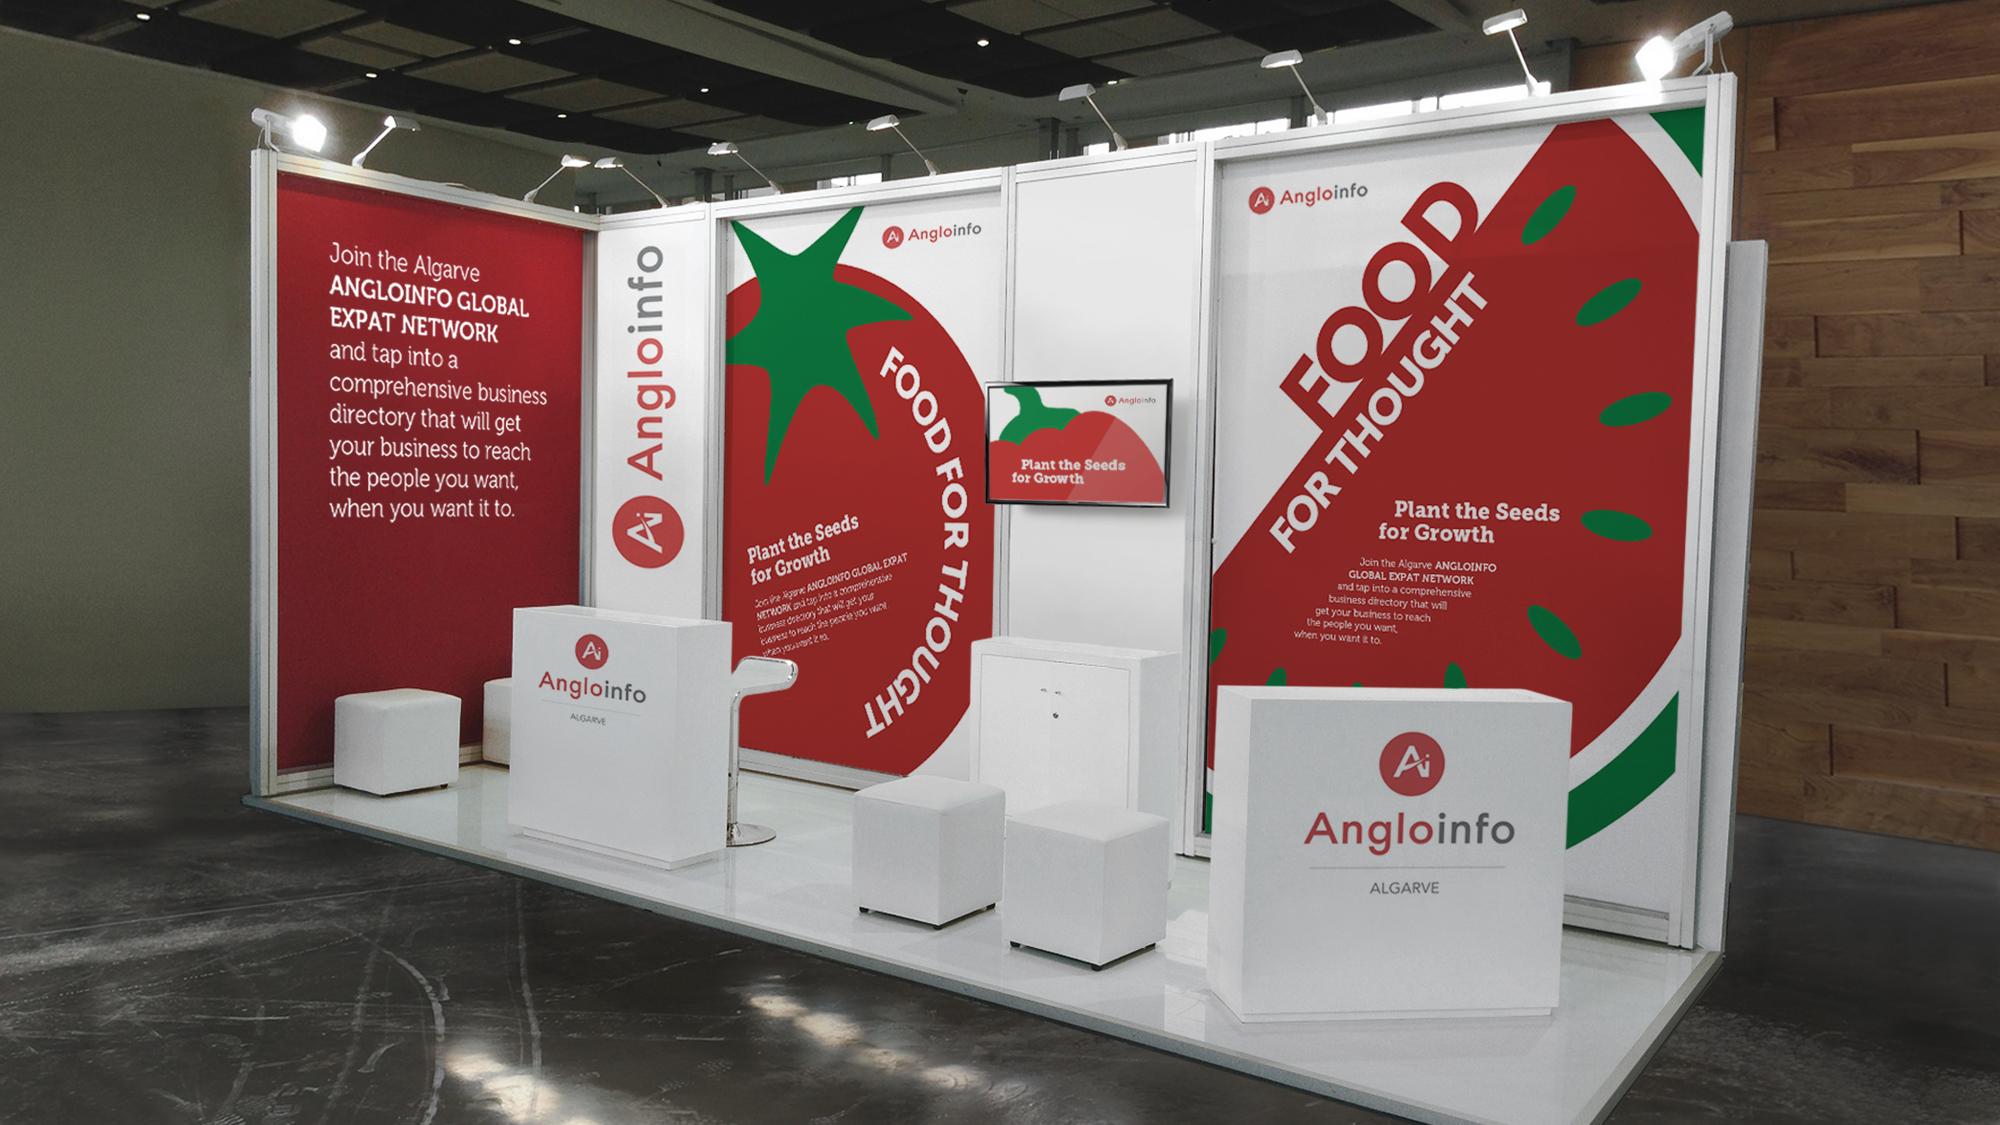 Brand_republica_exhibition_stand_design_angloinfo.jpg